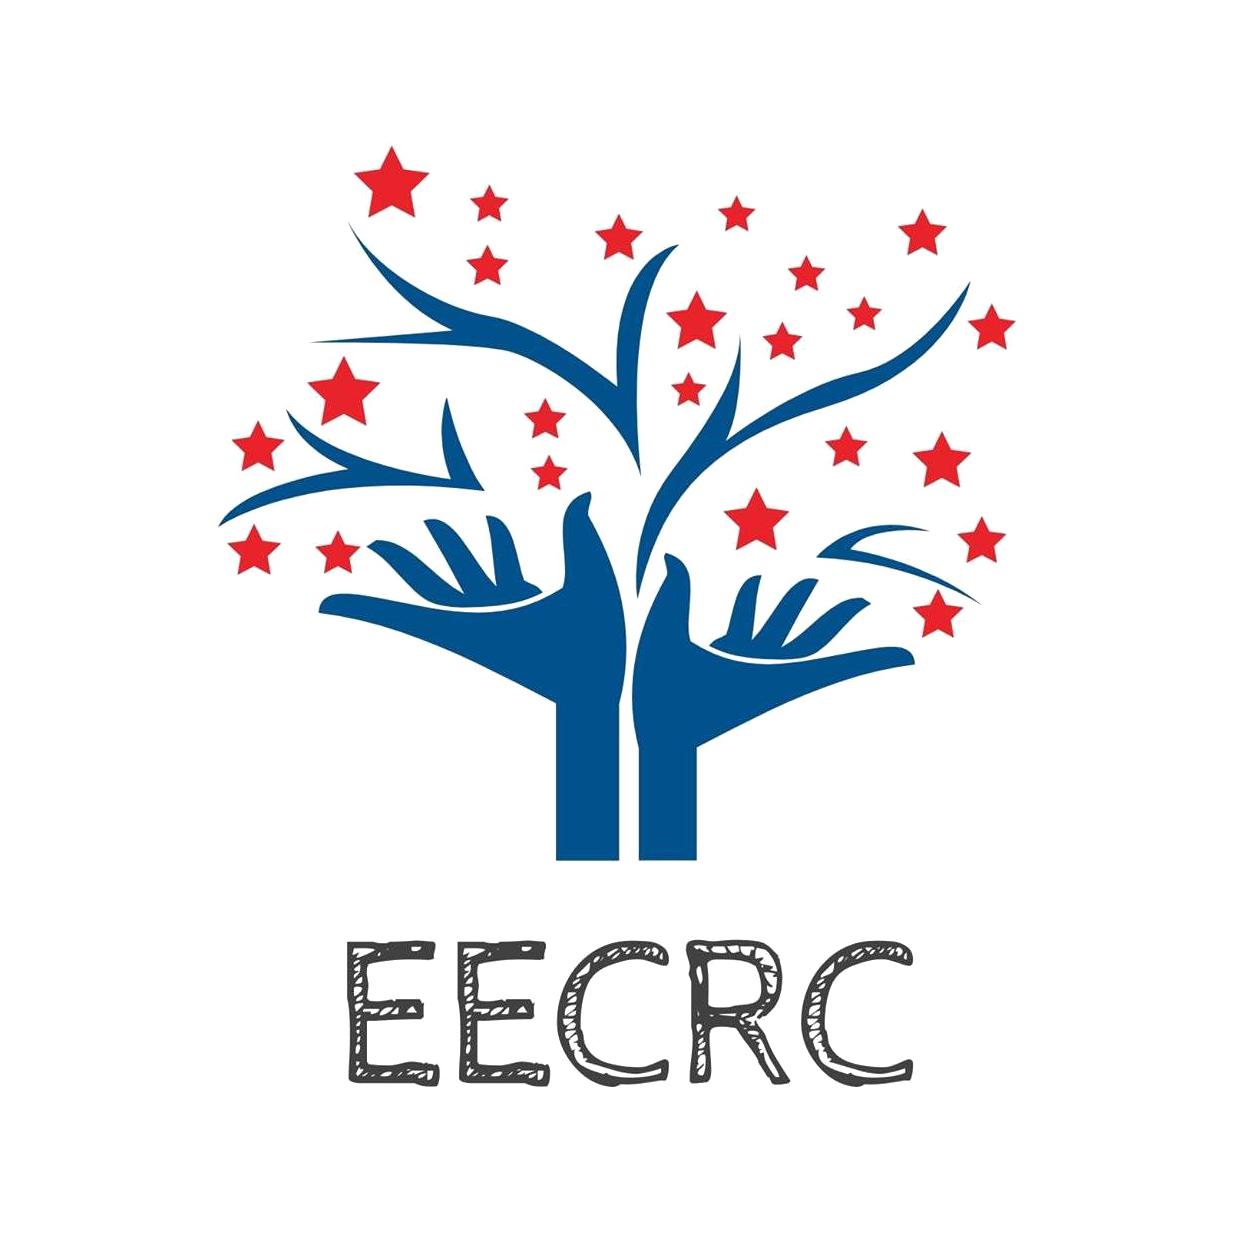 eecrc-logo.png